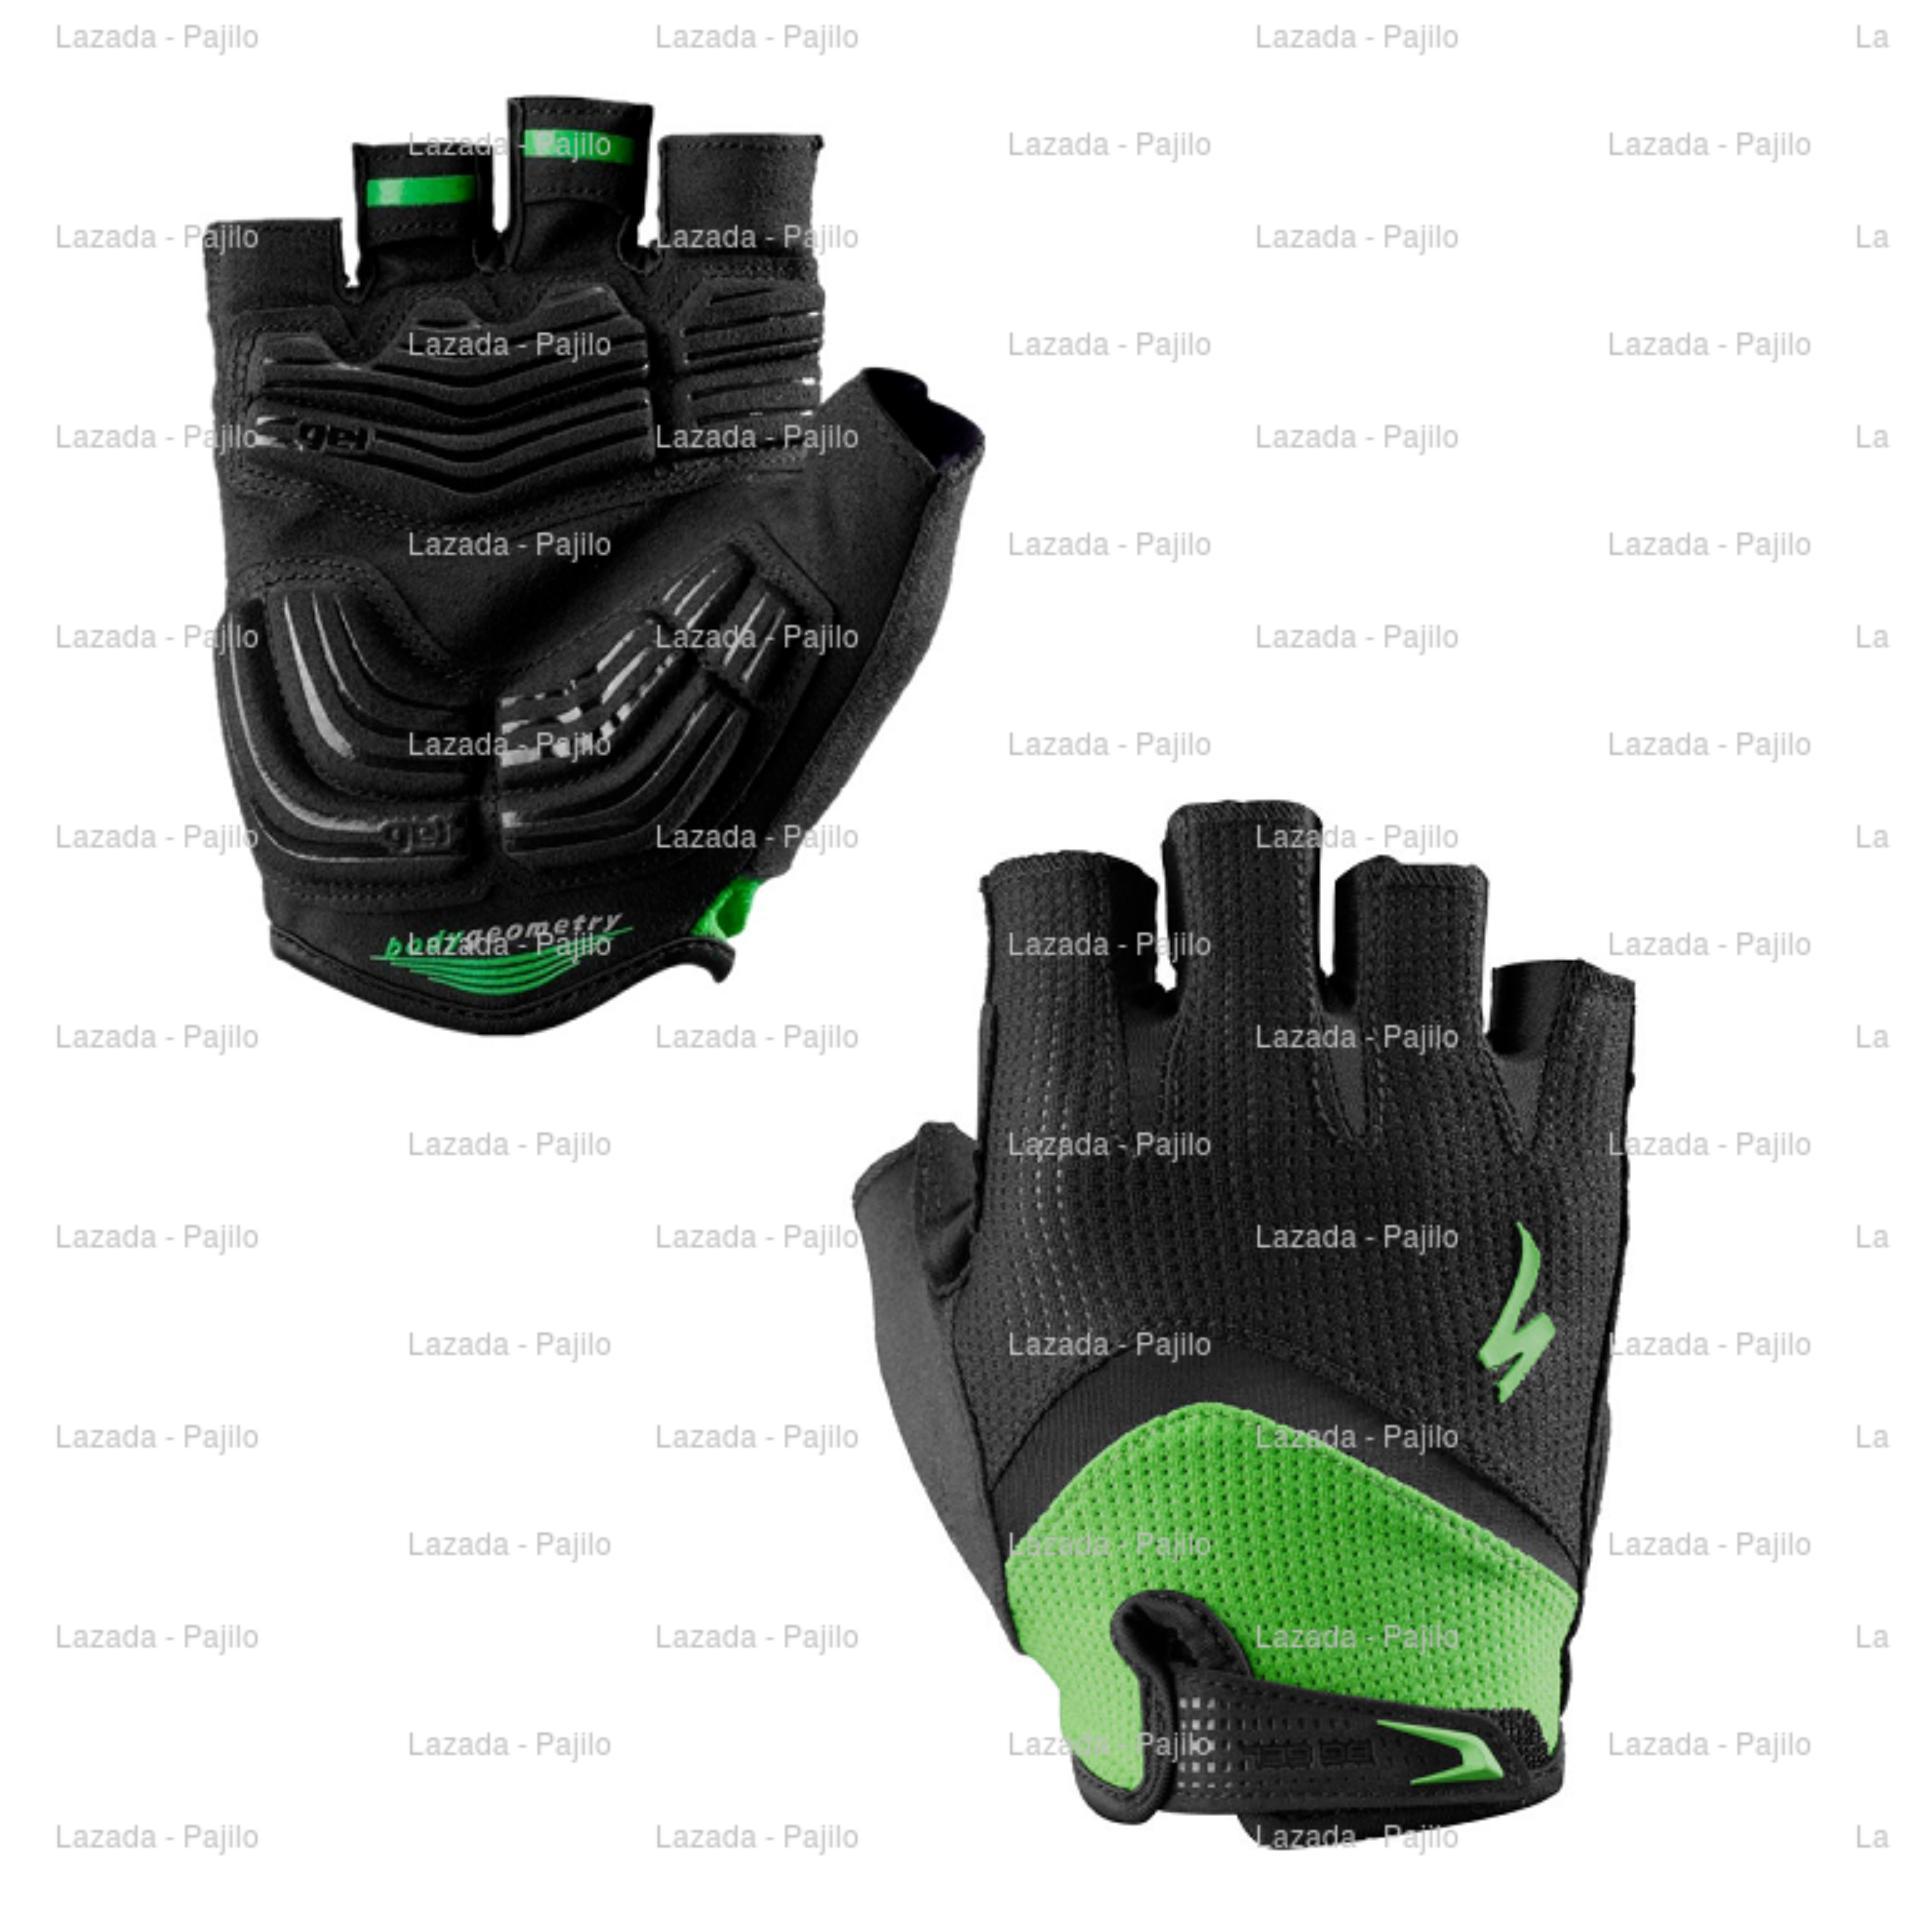 Hijau Specialized Half Bg Gel Wiretap Sarung Tangan Sepeda Motor Rockbros S109 Bike Glove Finger Green Full Touring Tour Bikers